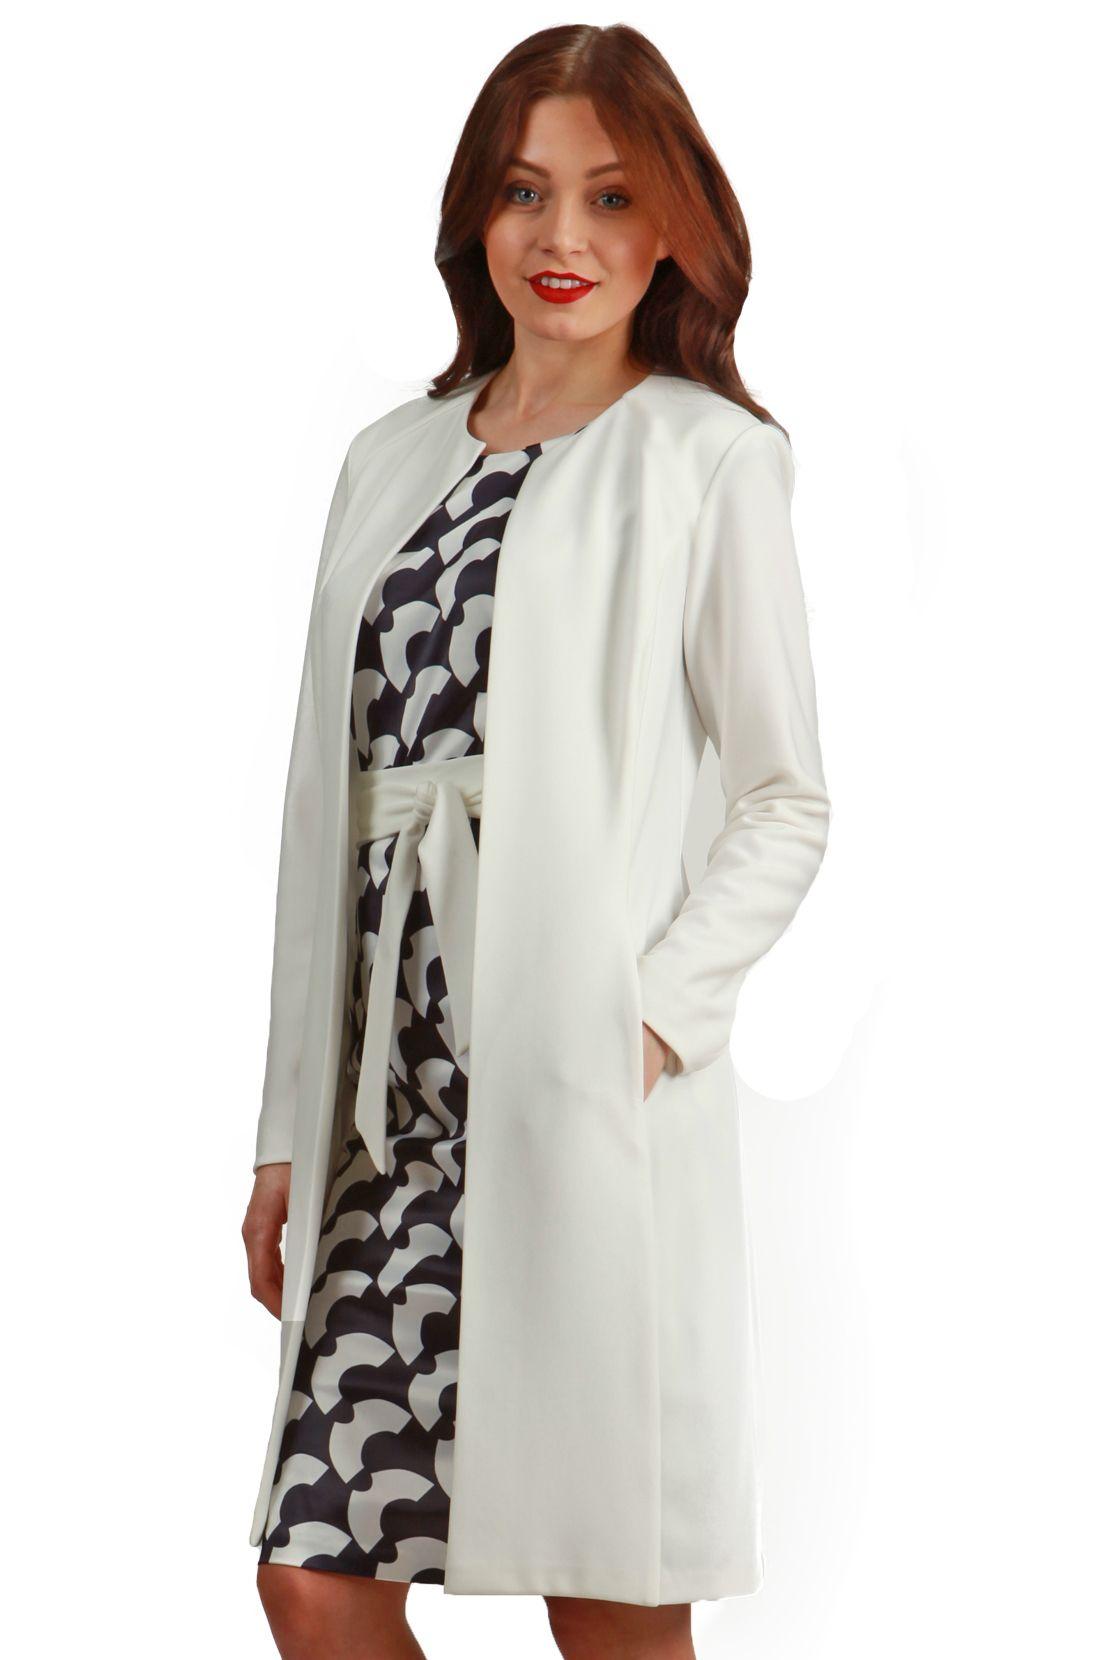 Twilight Coat in Ivory Cream